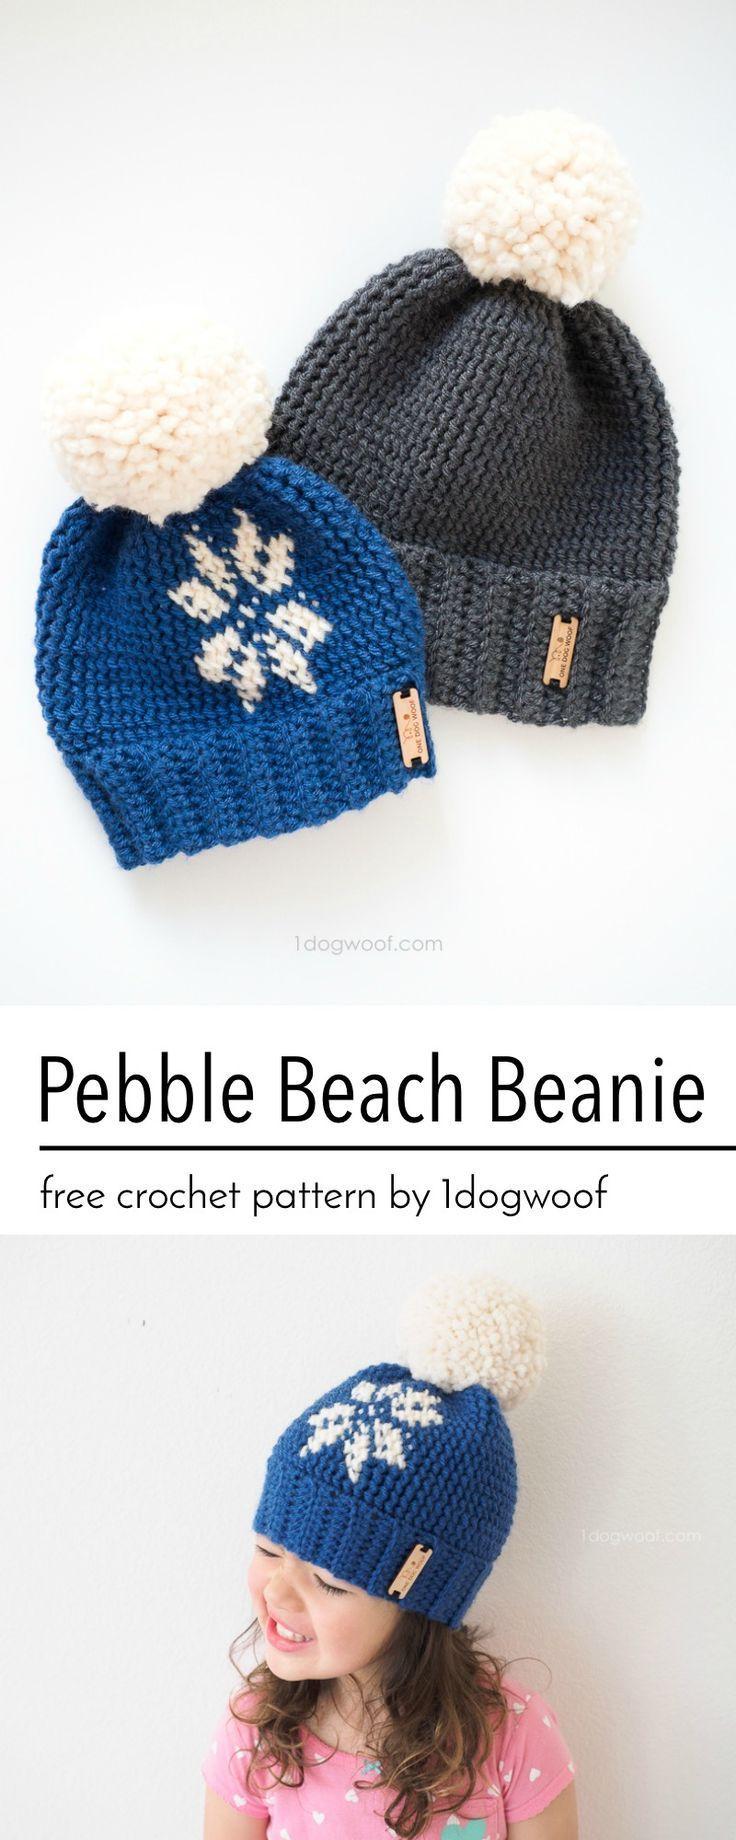 Pebble Beach Beanie Crochet Pattern | Crochet Hats and Headbands ...